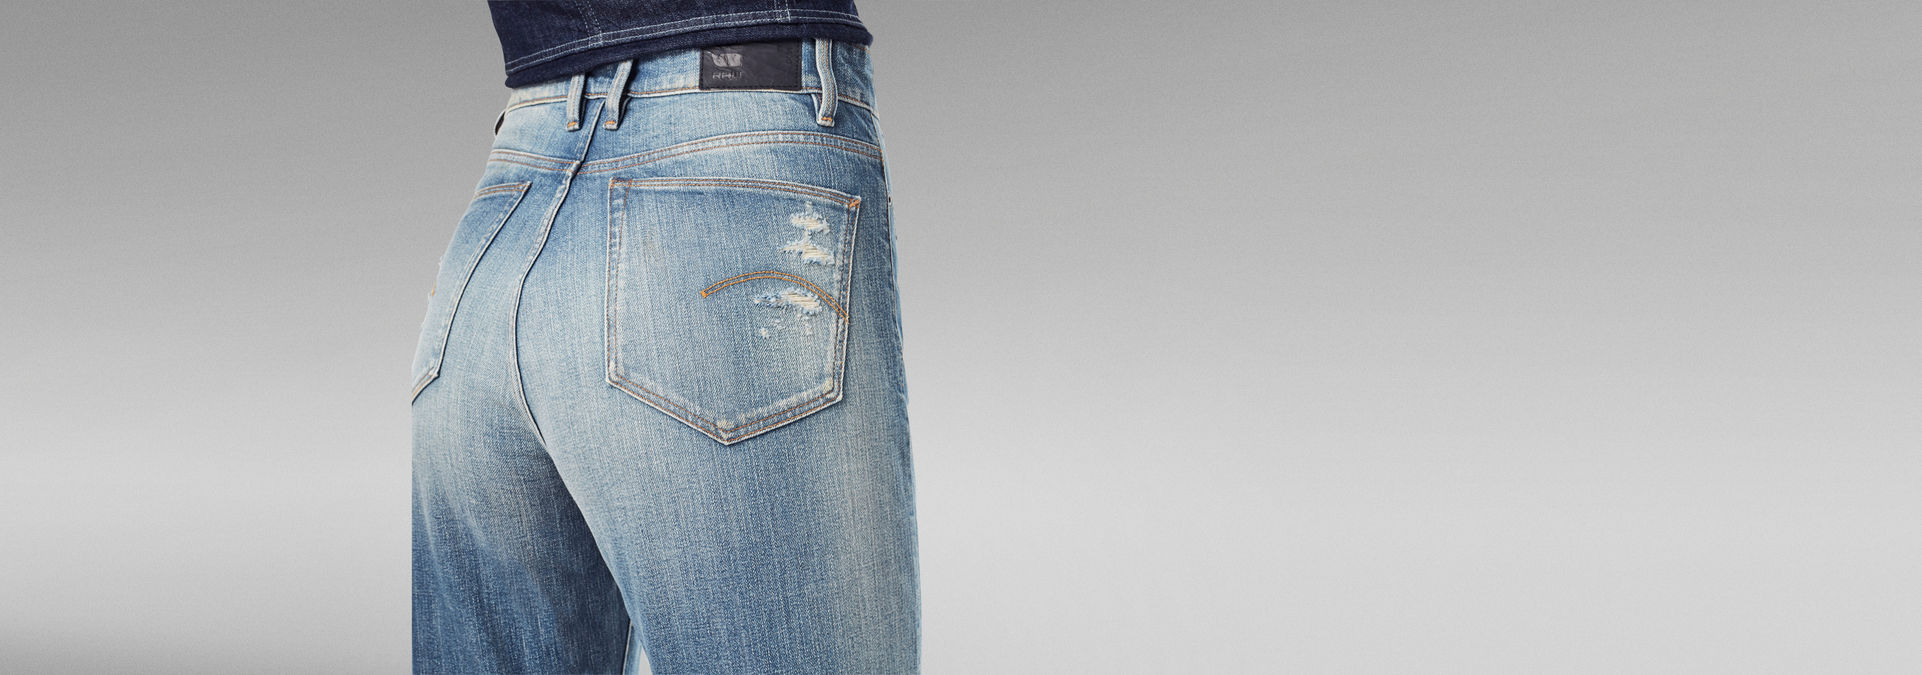 Janeh Ultra High Mom Ankle Jeans   Hellblau   G Star RAW®